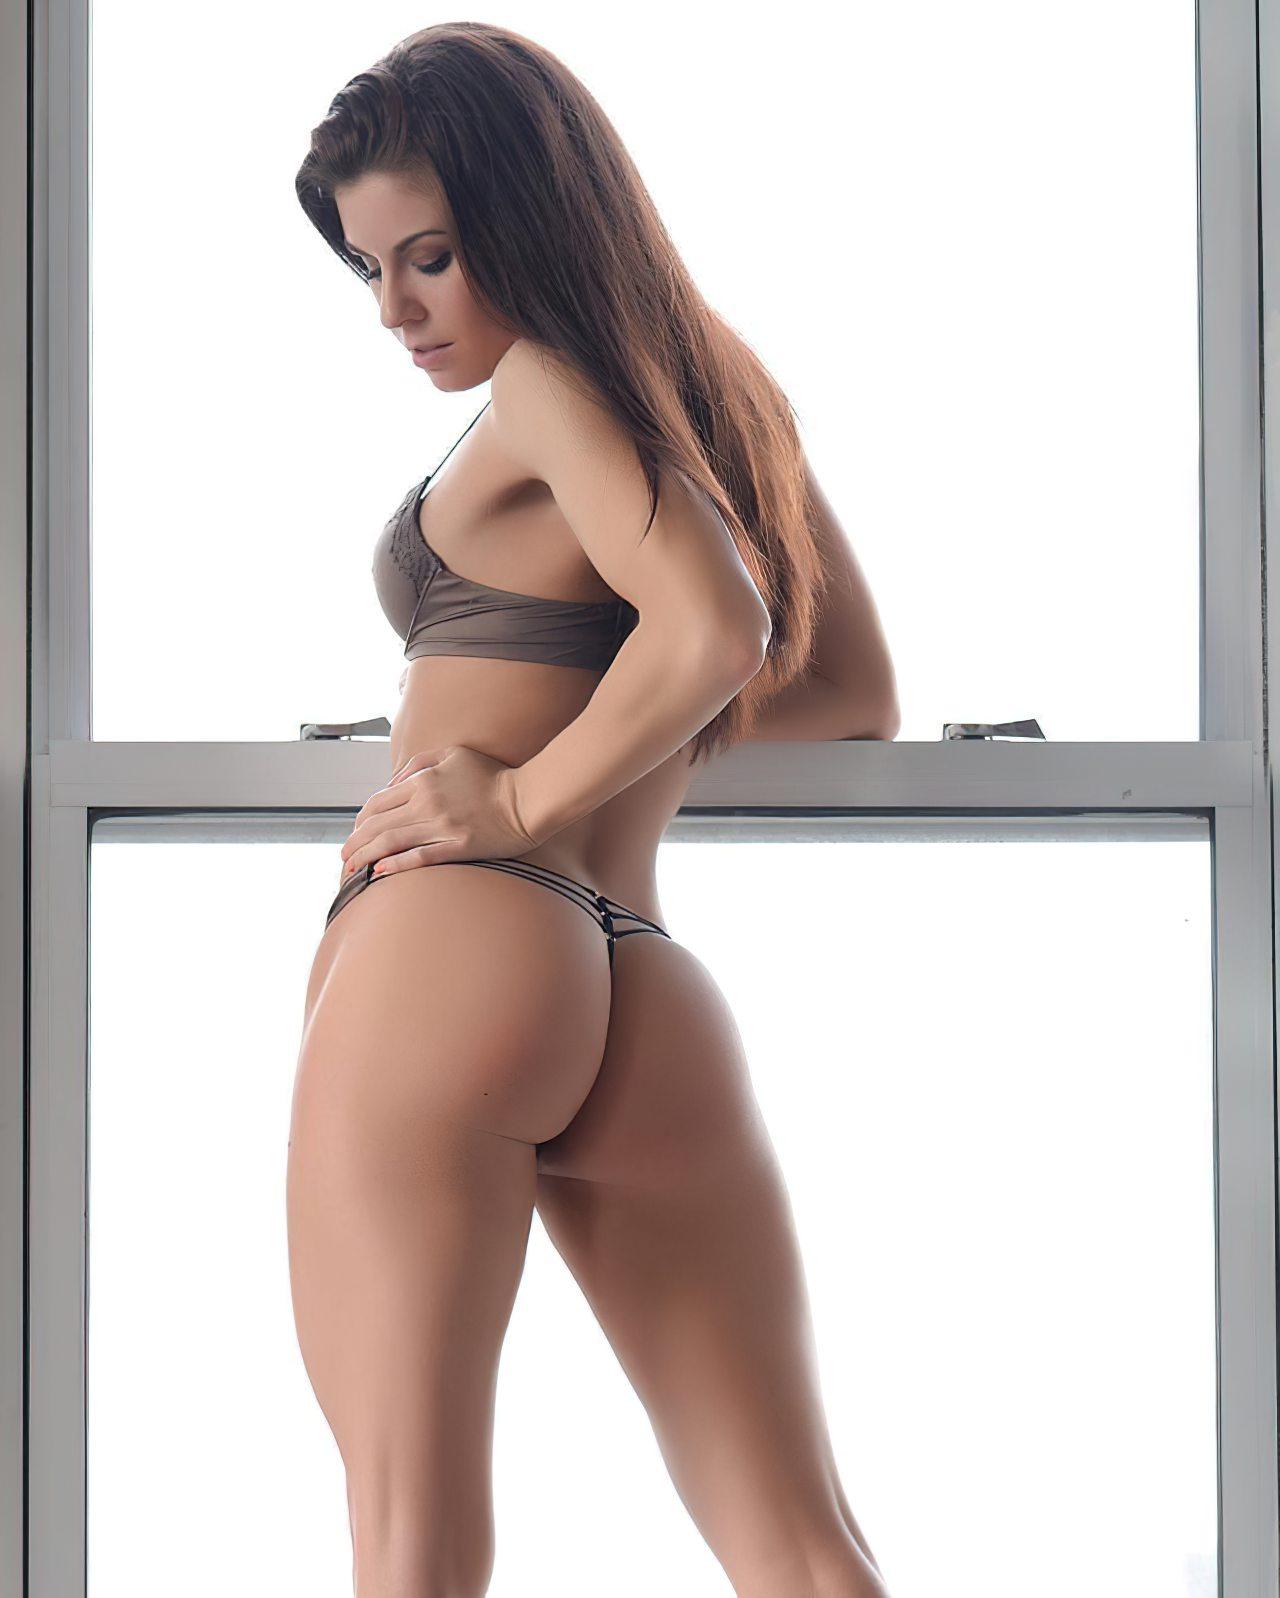 Mulheres Despidas Fotos (46)